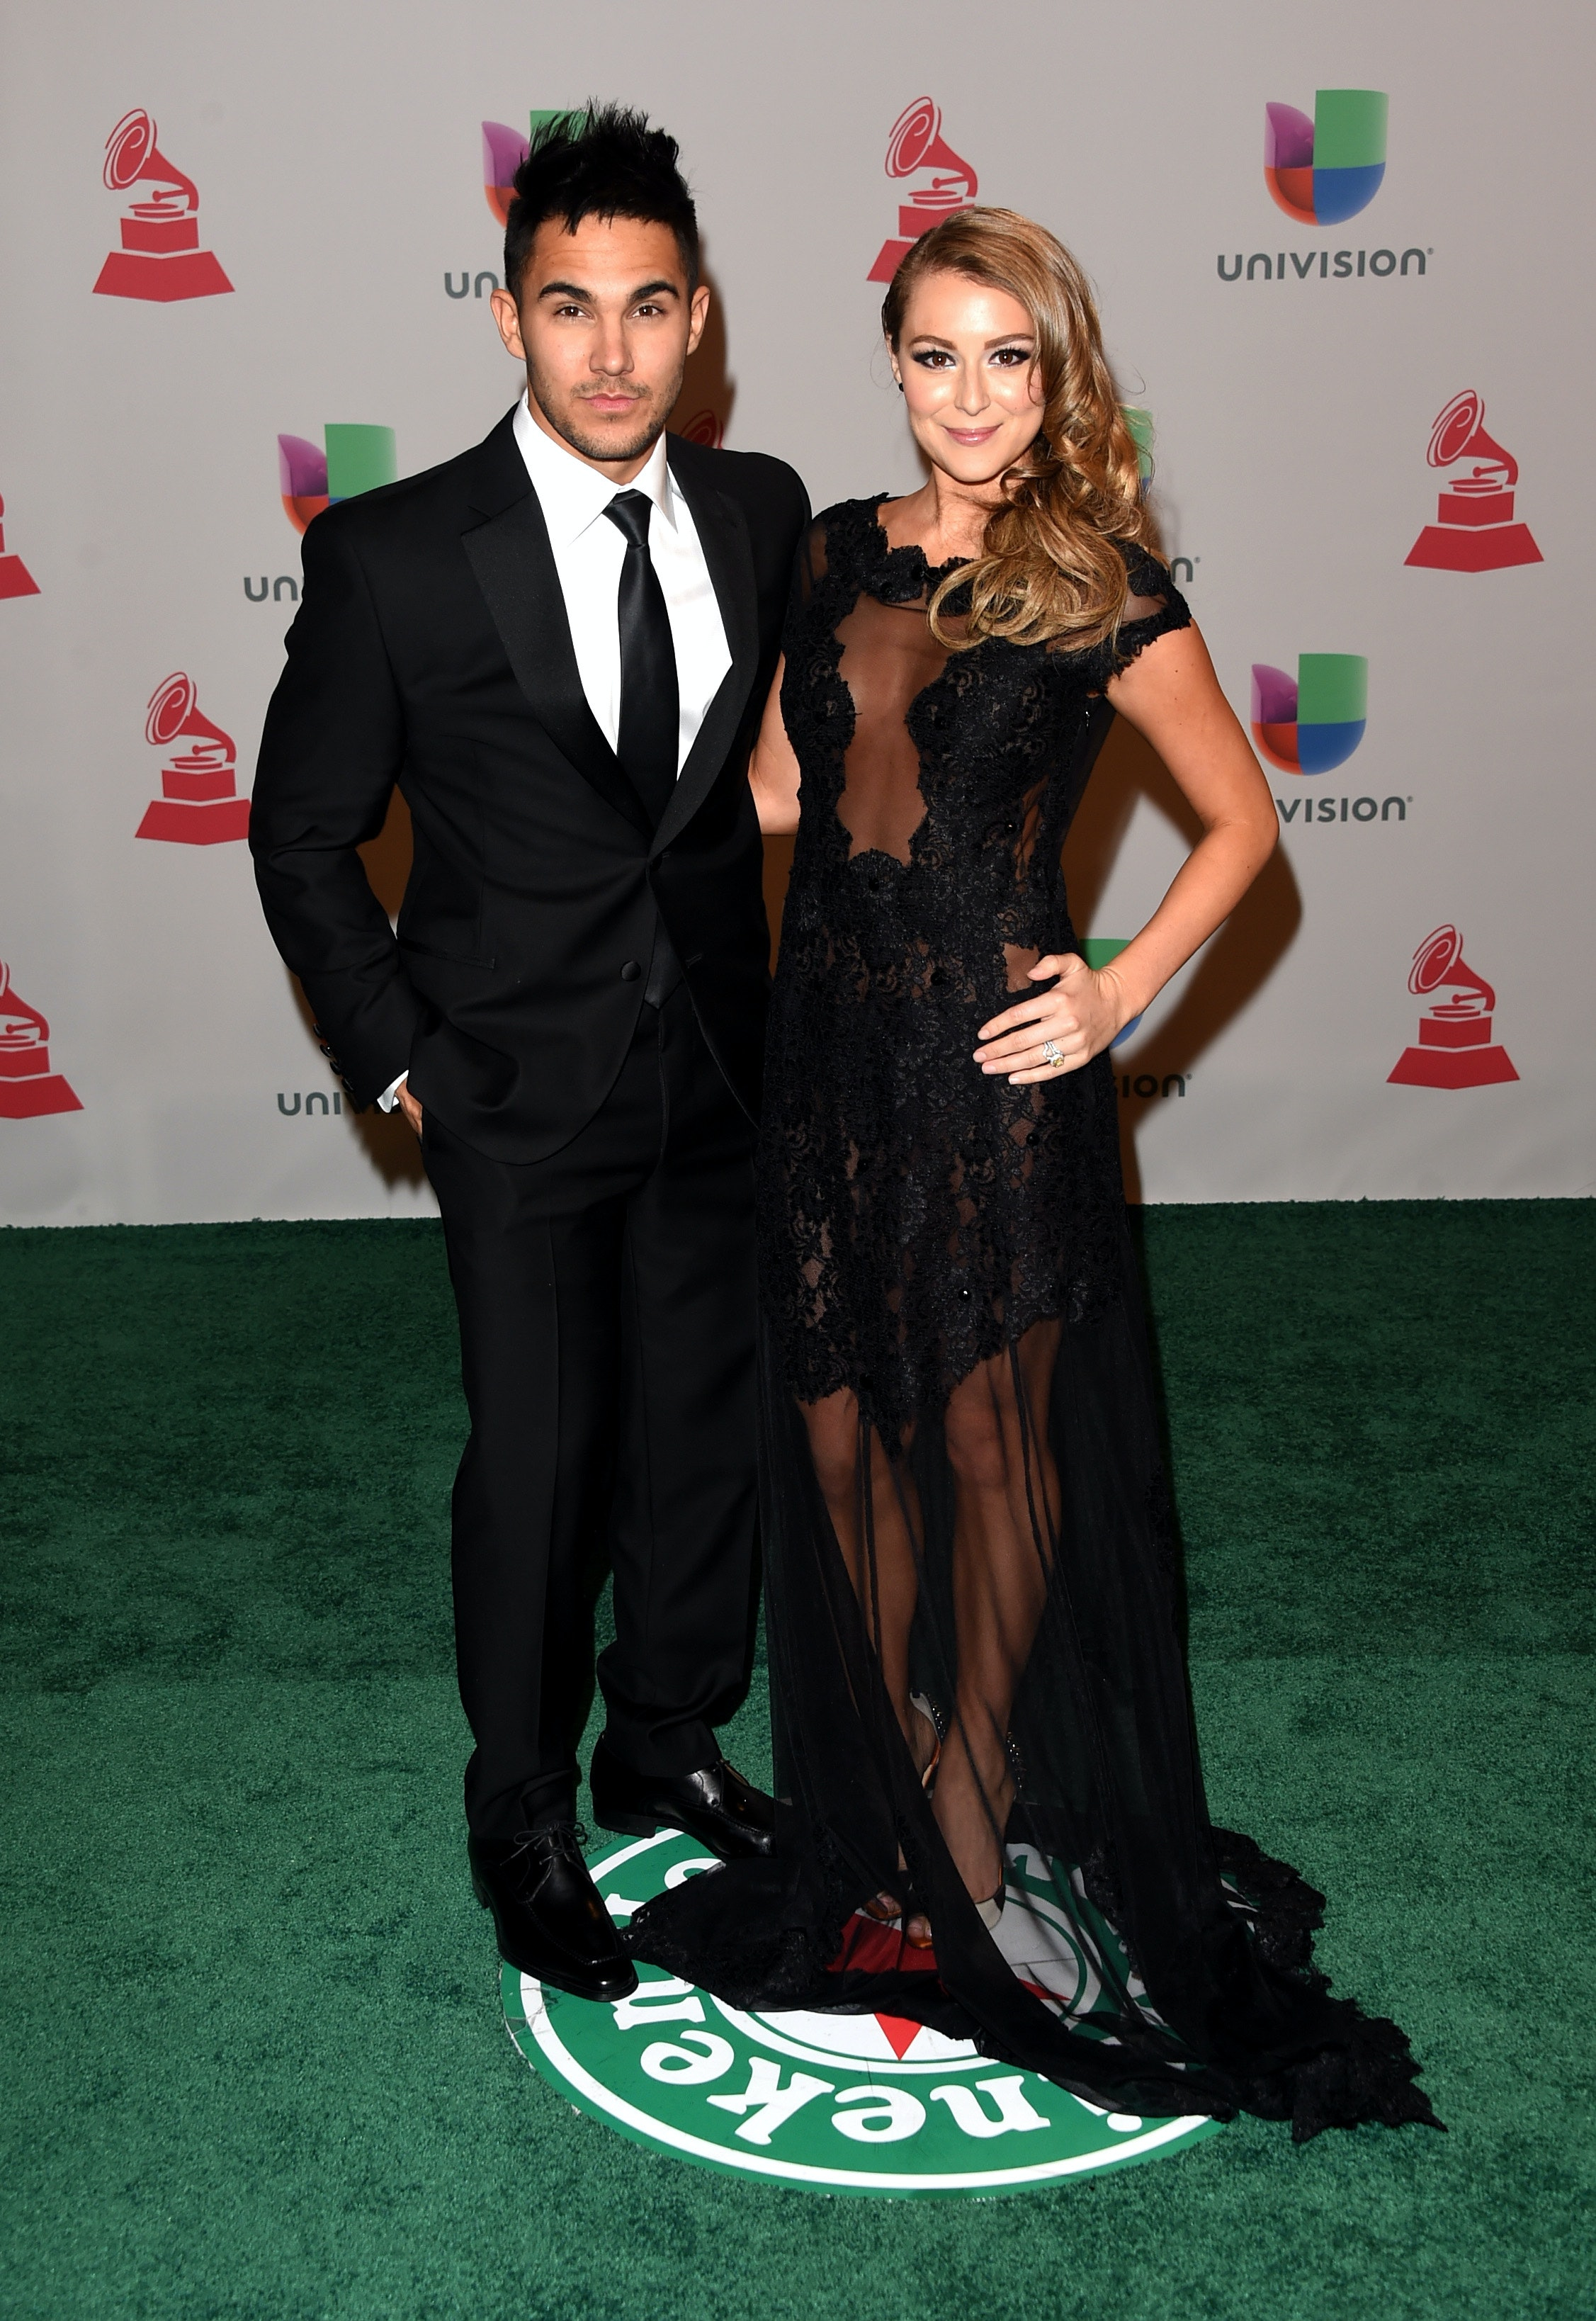 How Did Carlos Alexa Penavega Meet The Dancing With The Stars